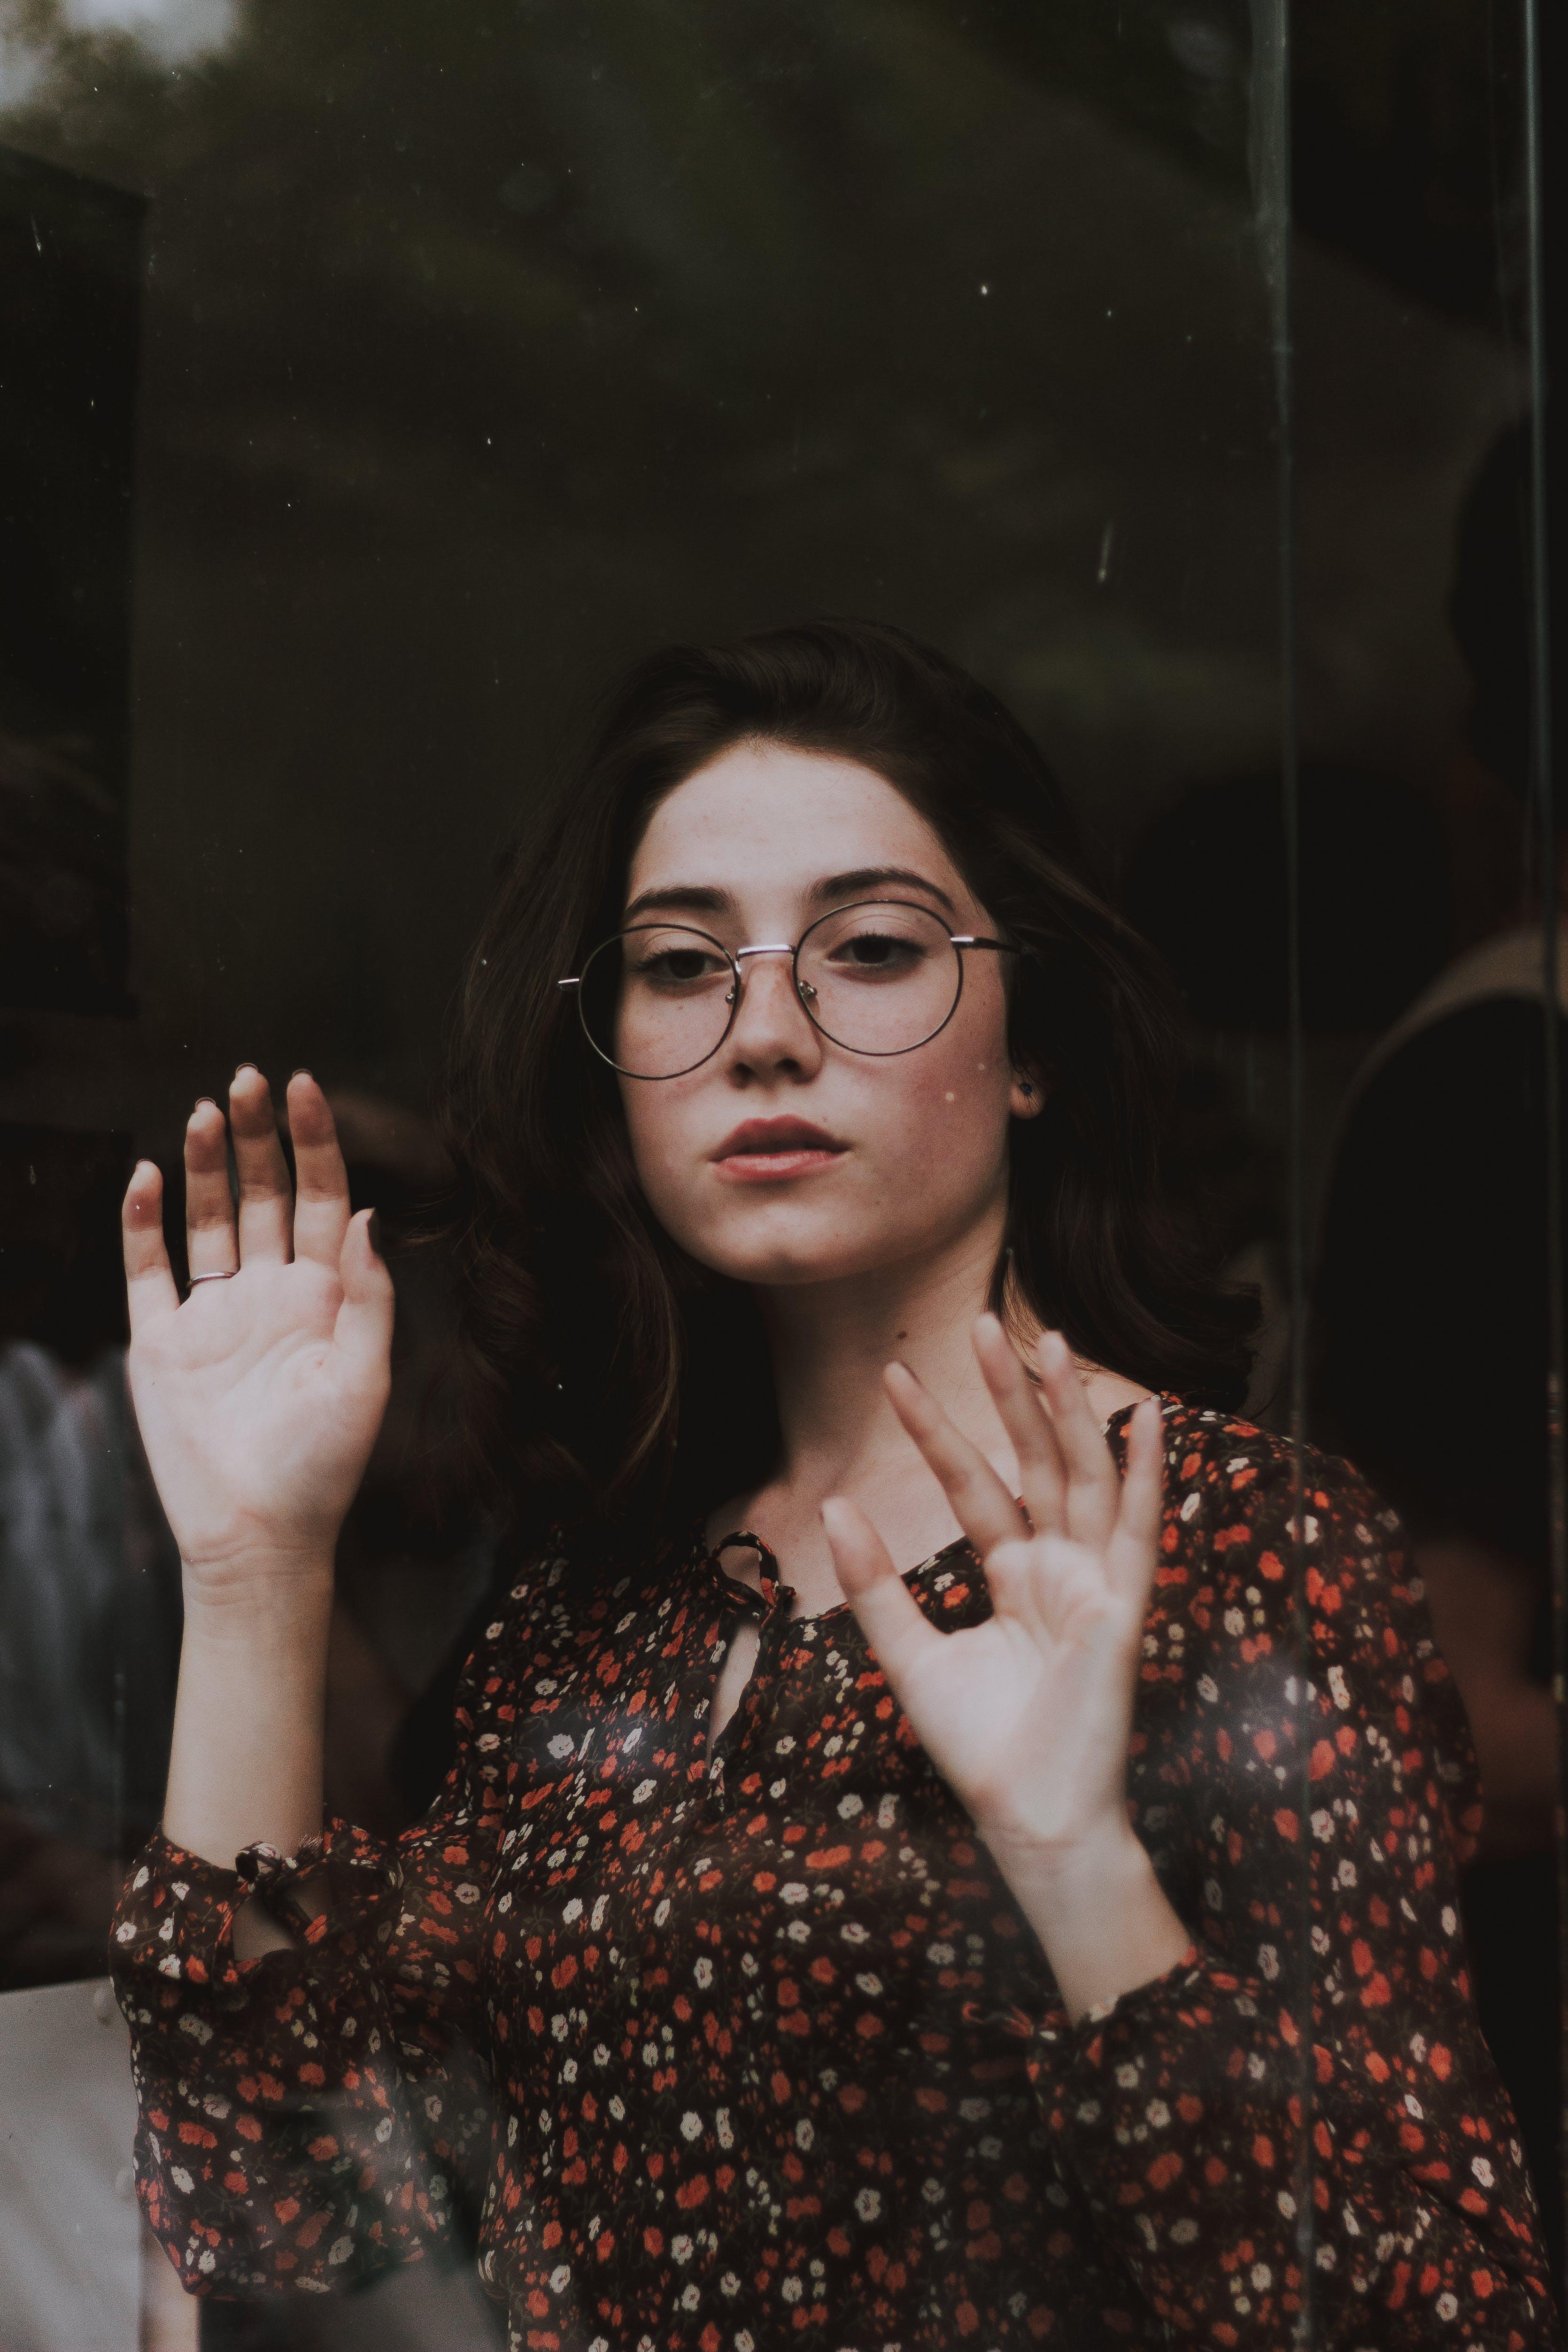 Free stock photo of adult, brunette, eyeglasses, eyewear